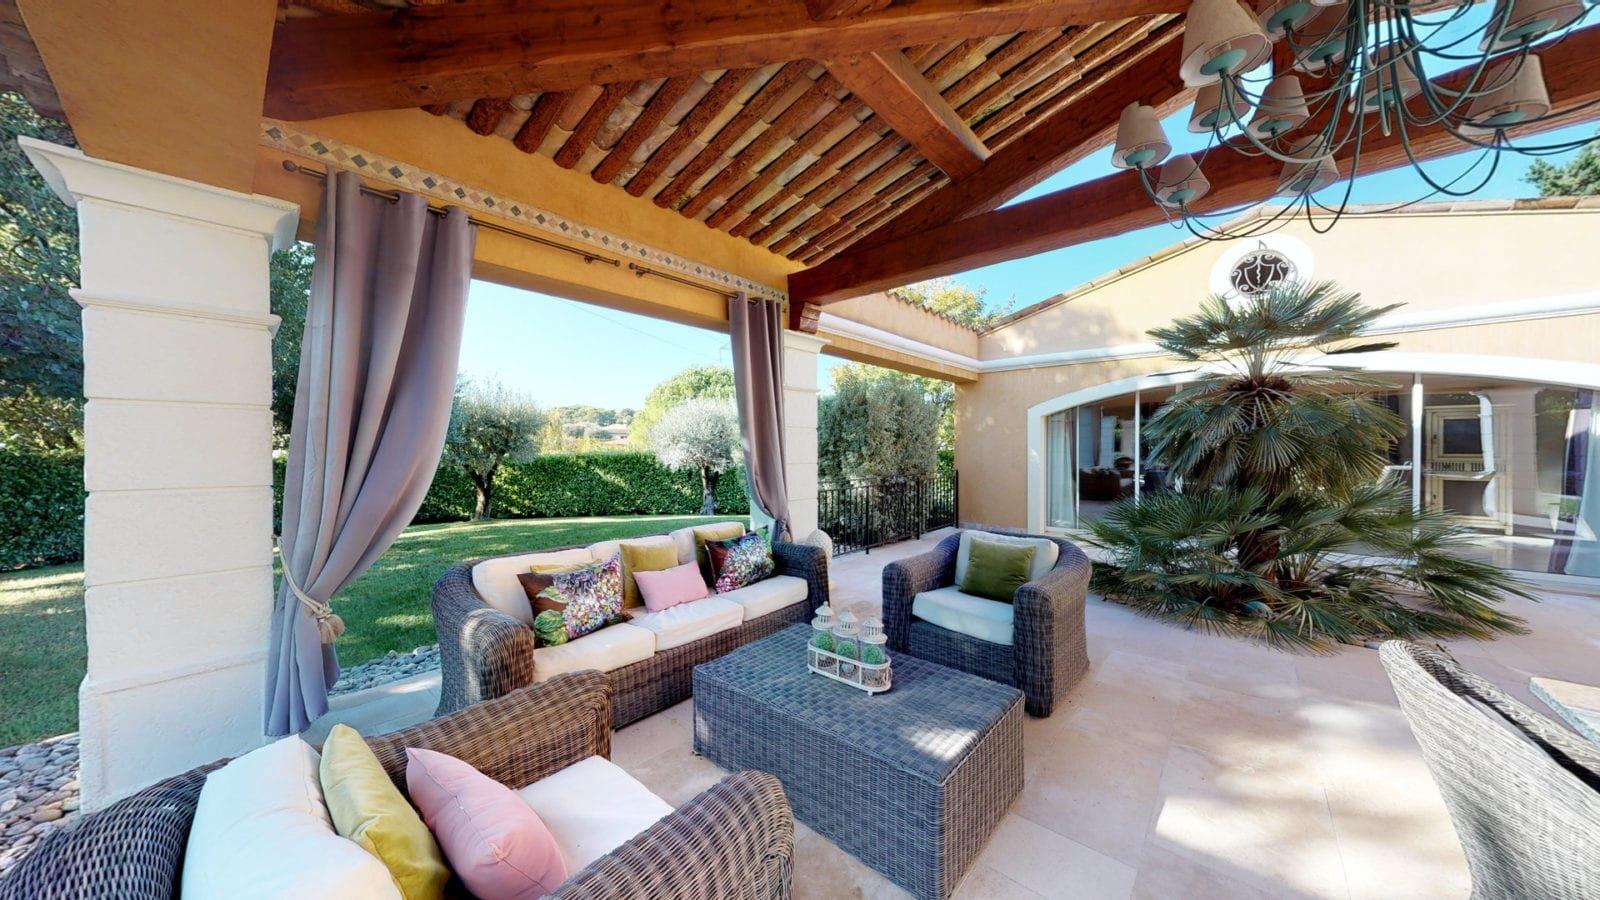 Villa for sale in Mouans-Sartoux close to Mougins